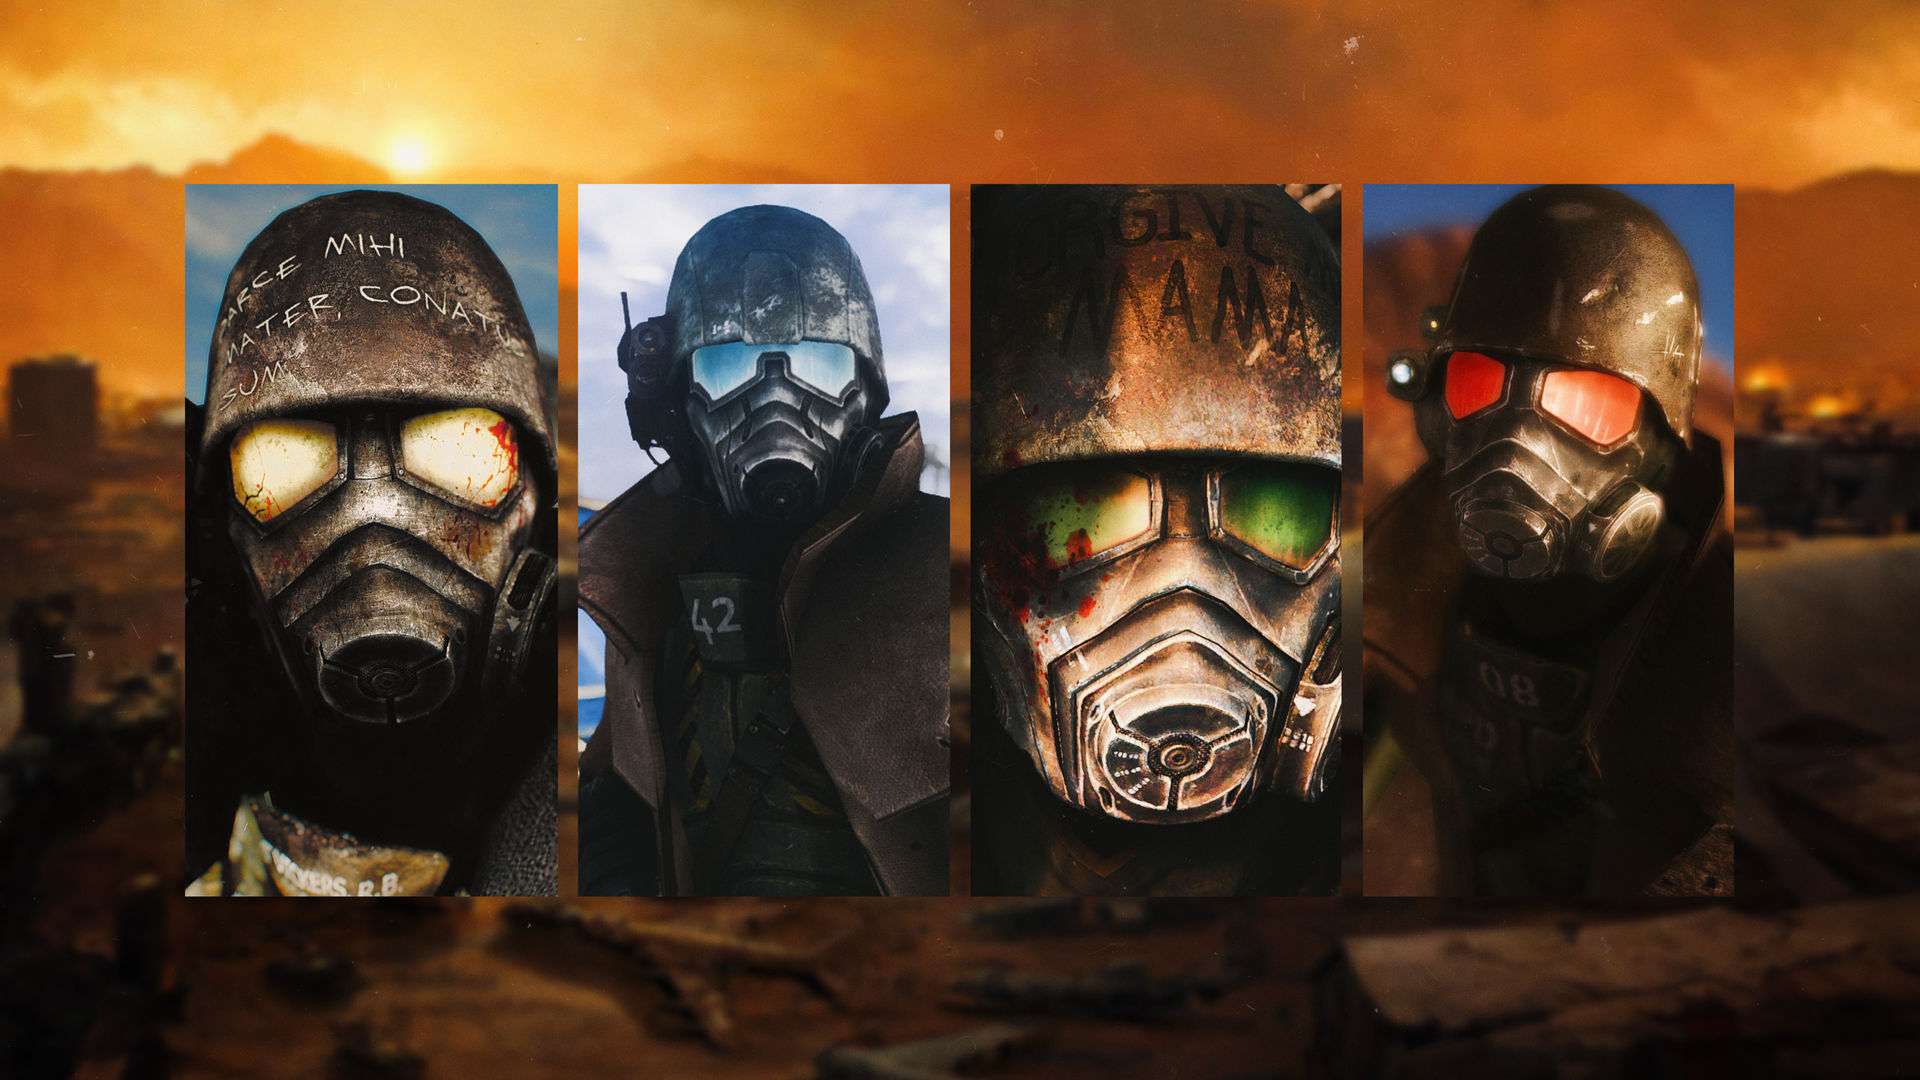 Fallout New Vegas Ncr Veteran Ranger Wallpaper 4k By